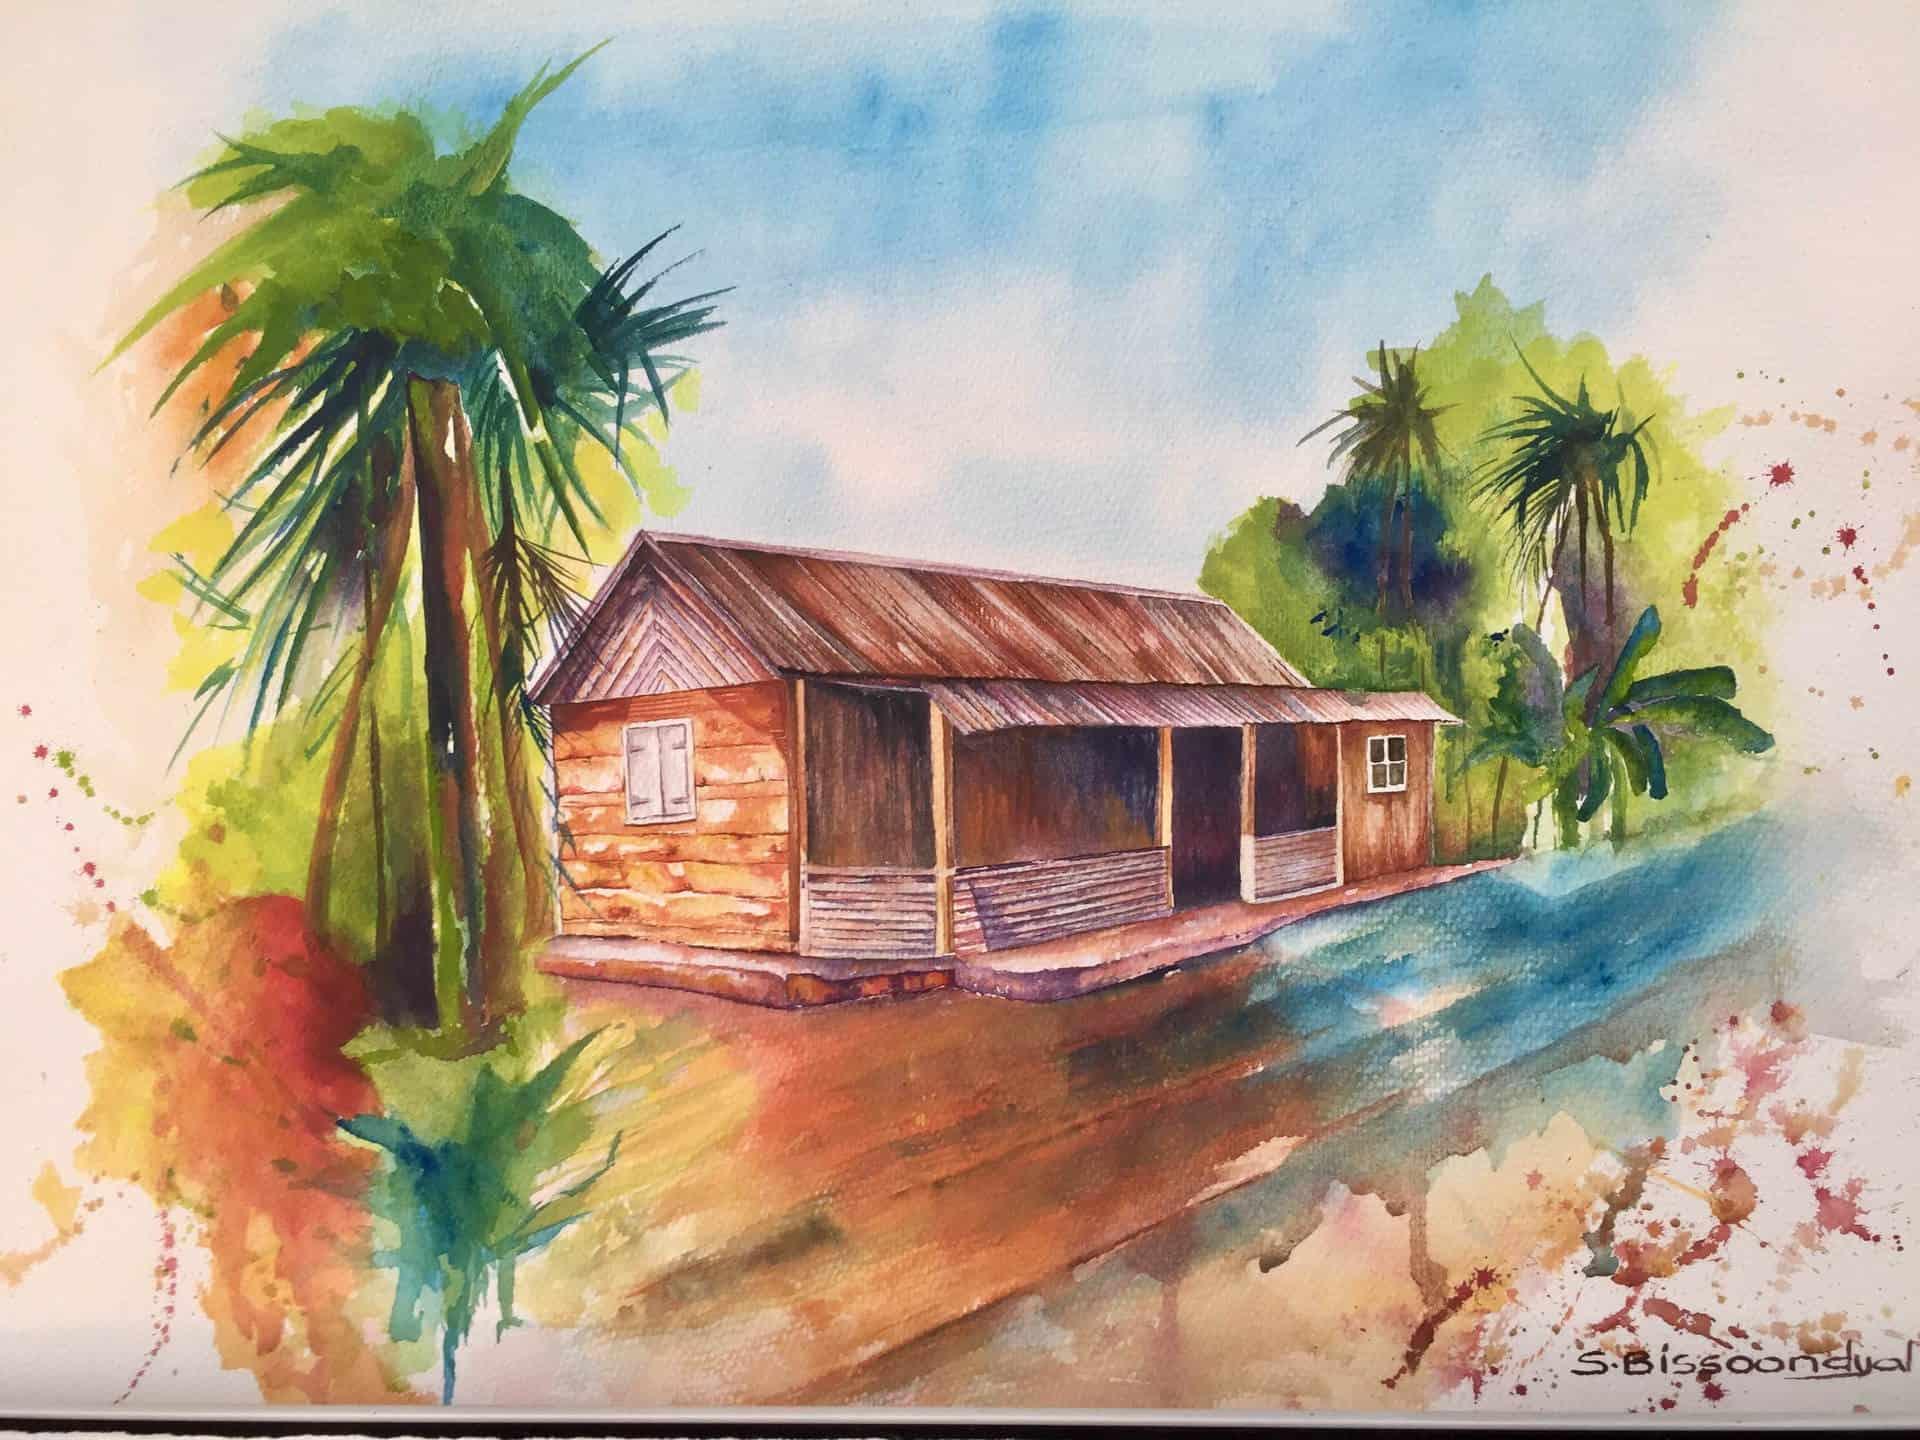 mauritius-samanta-bissoondyal-ramguttee-maison-en-tole